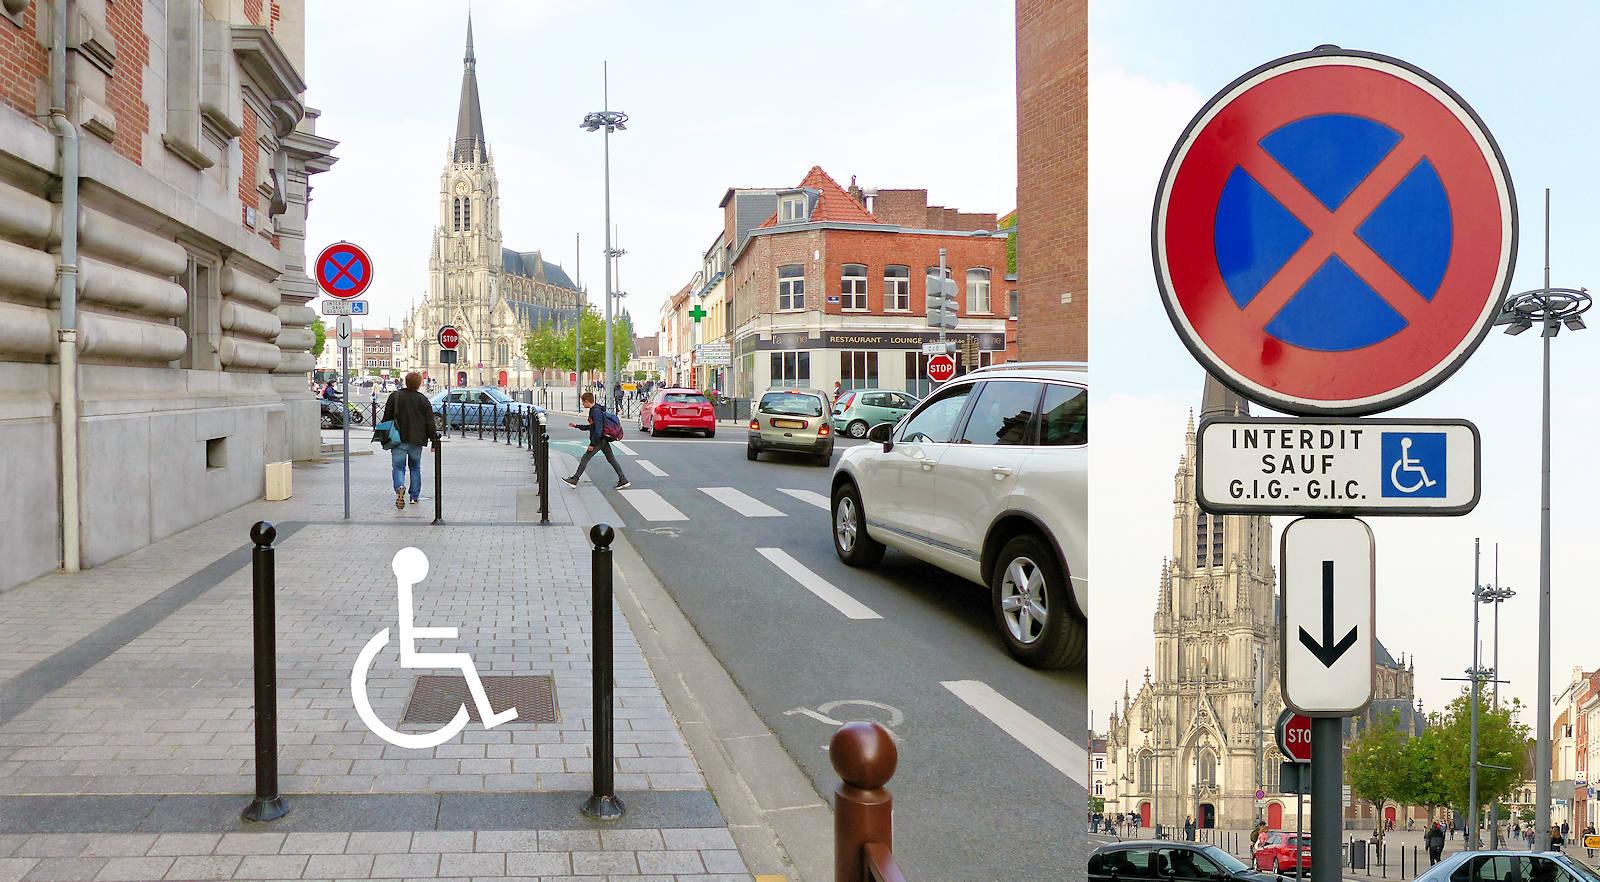 Rue des anges, Tourcoing - Place stationnement PMR